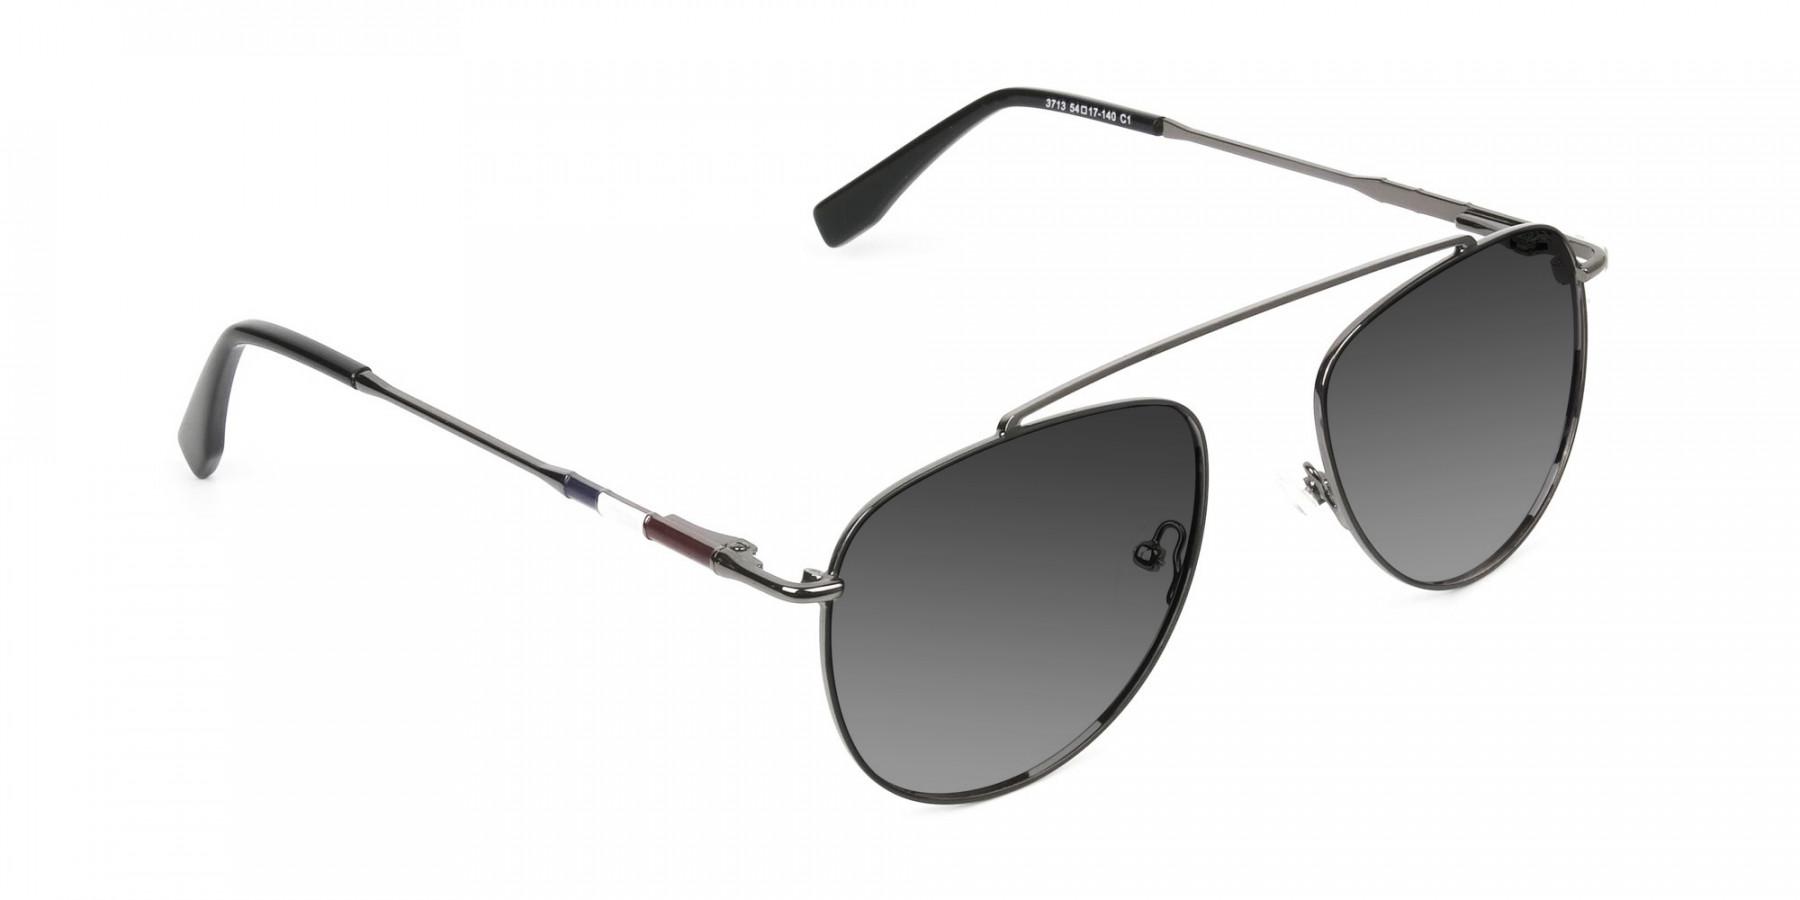 dark-navy-silver-metal-Grey-tinted-aviator-sunglasses-3